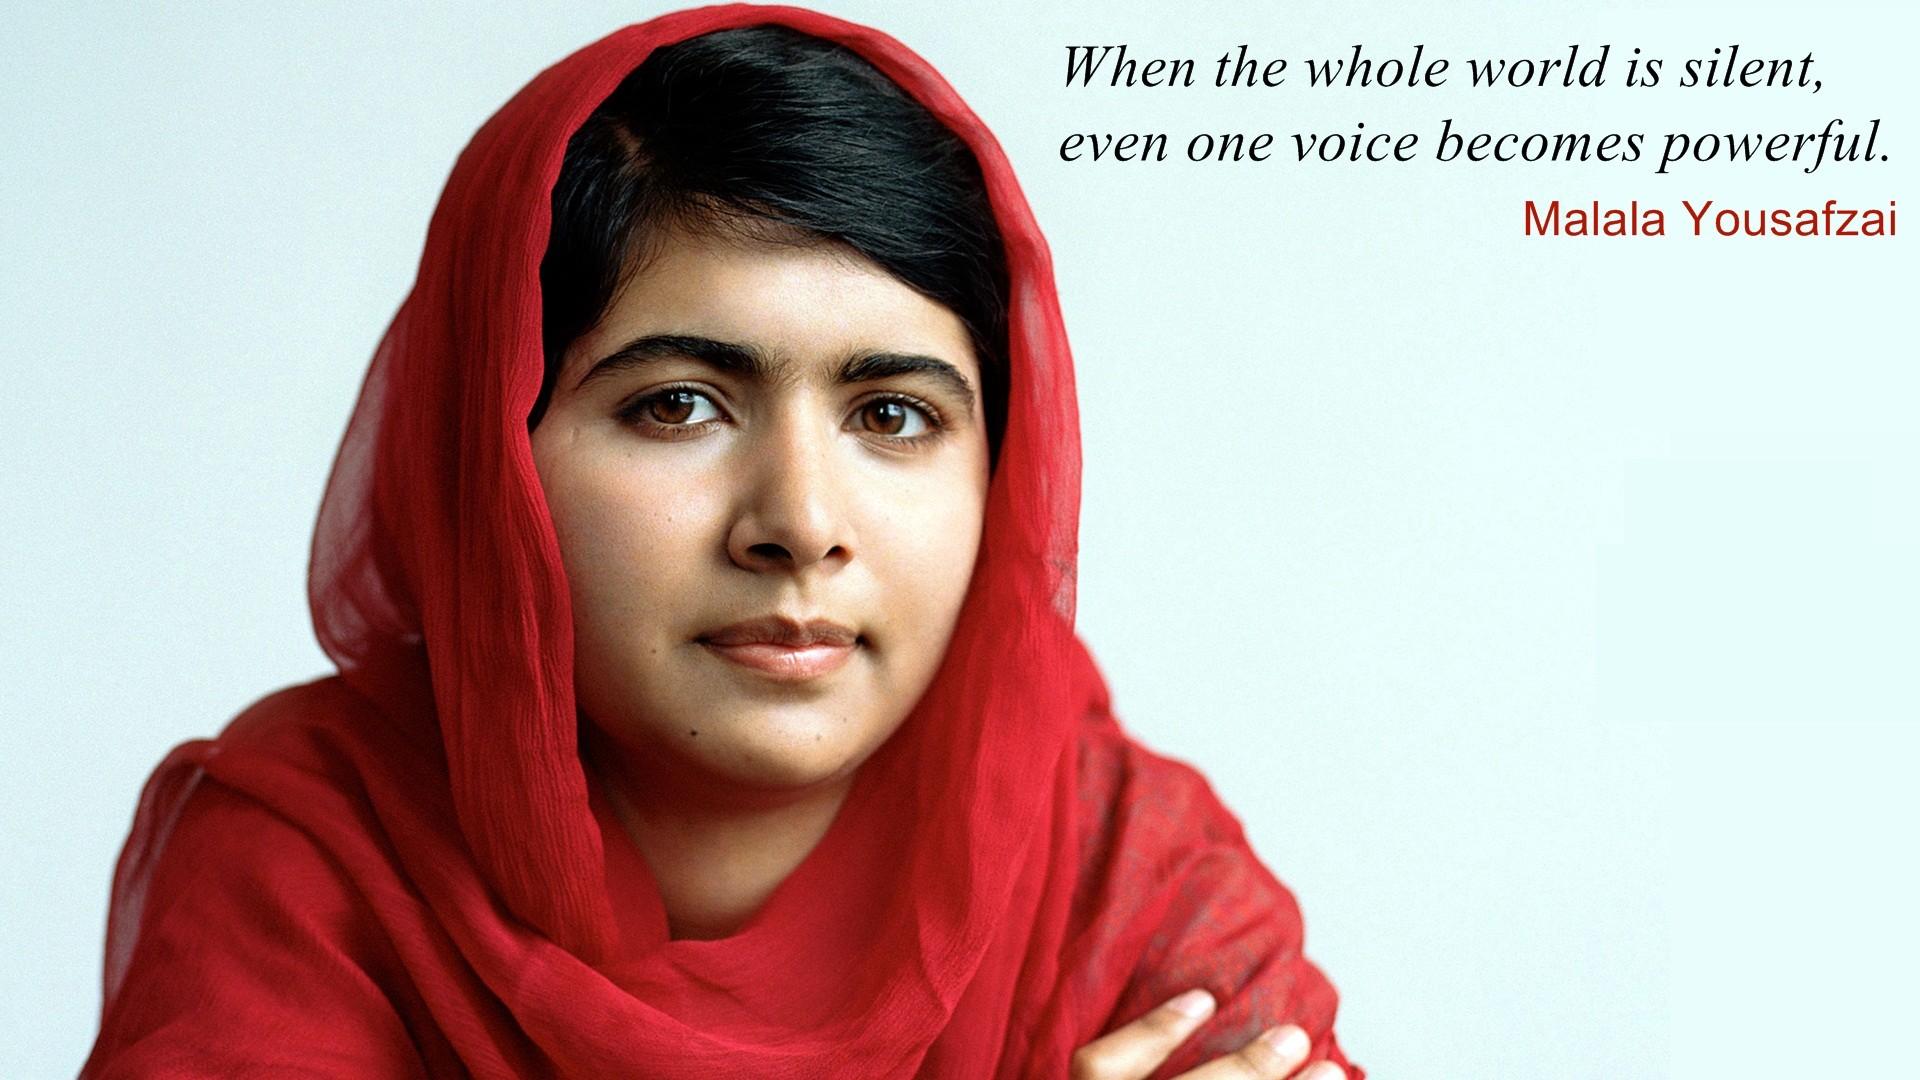 Malala Yousafzai wallpaper 1920x1080 63701 1920x1080